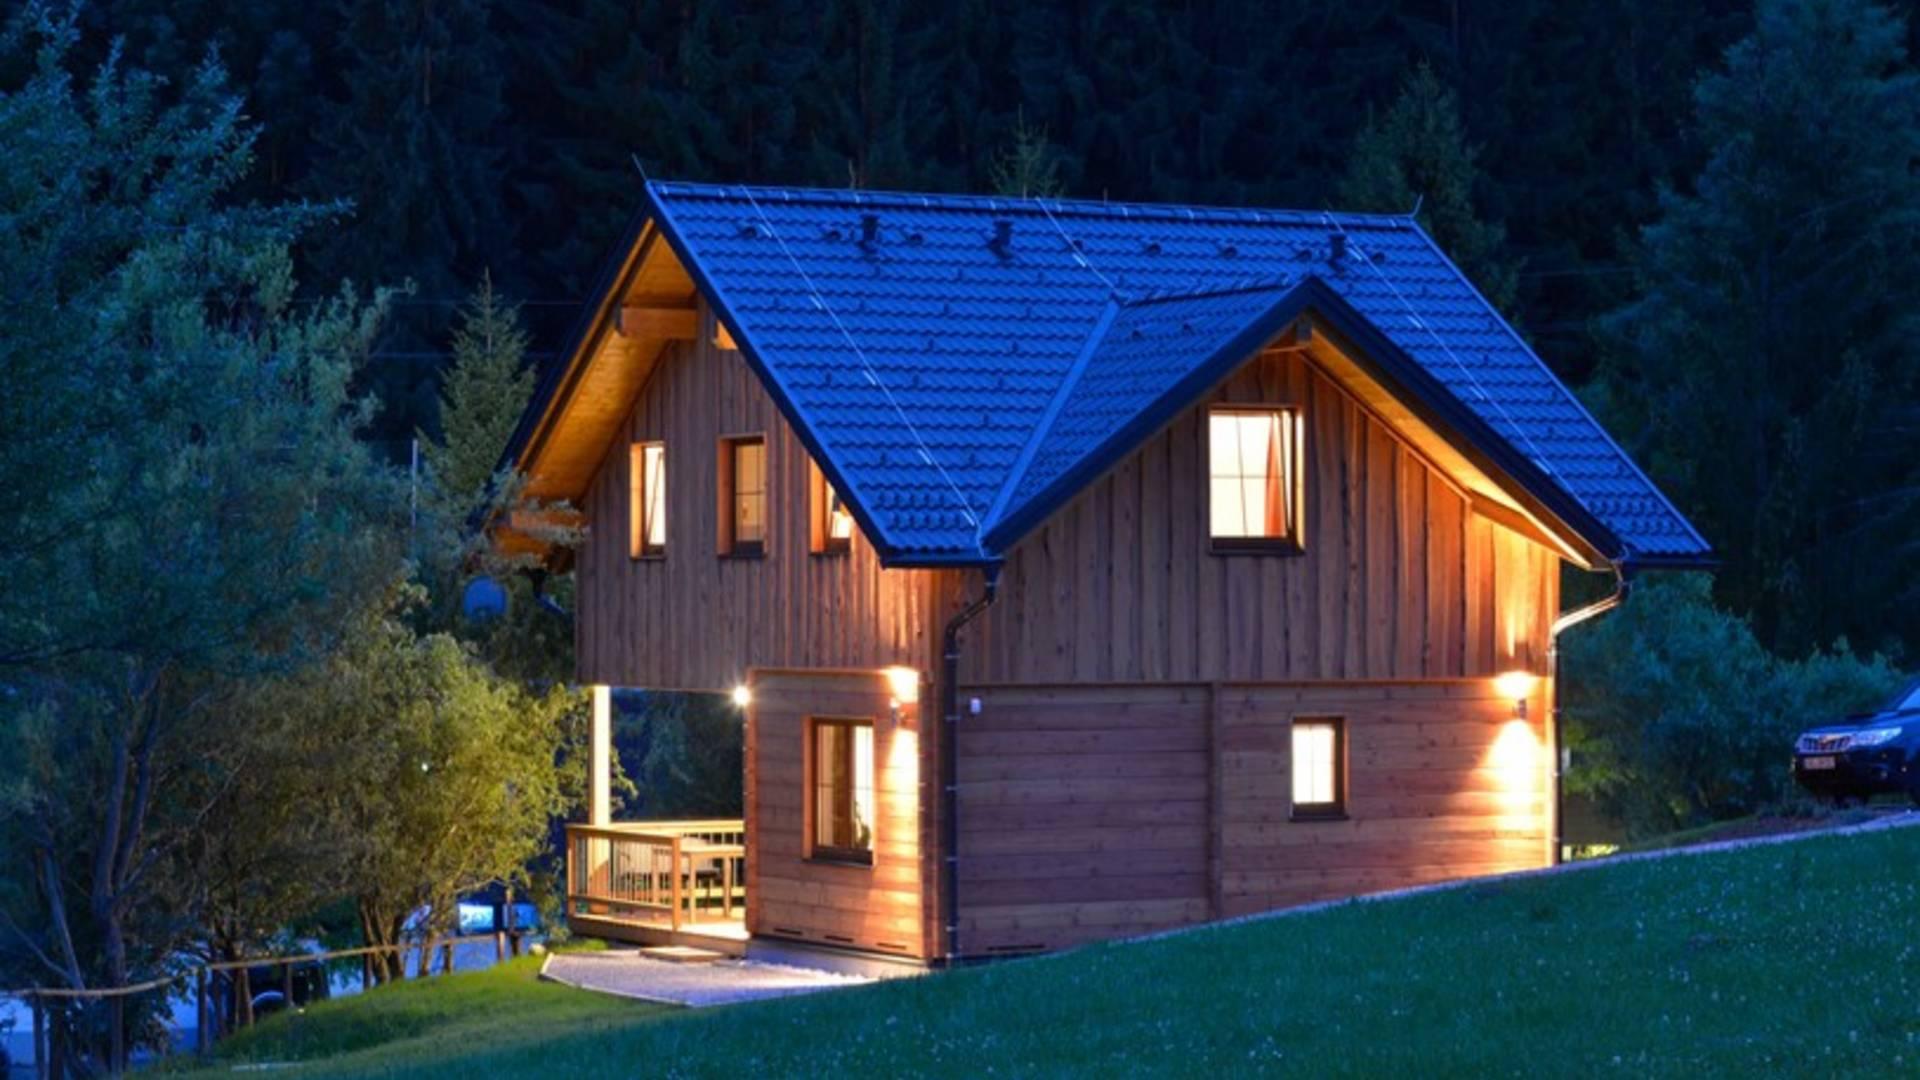 <p>Camping, Mobile Homes, Camping, Mobile Homes, Seecamping Berghof</p>